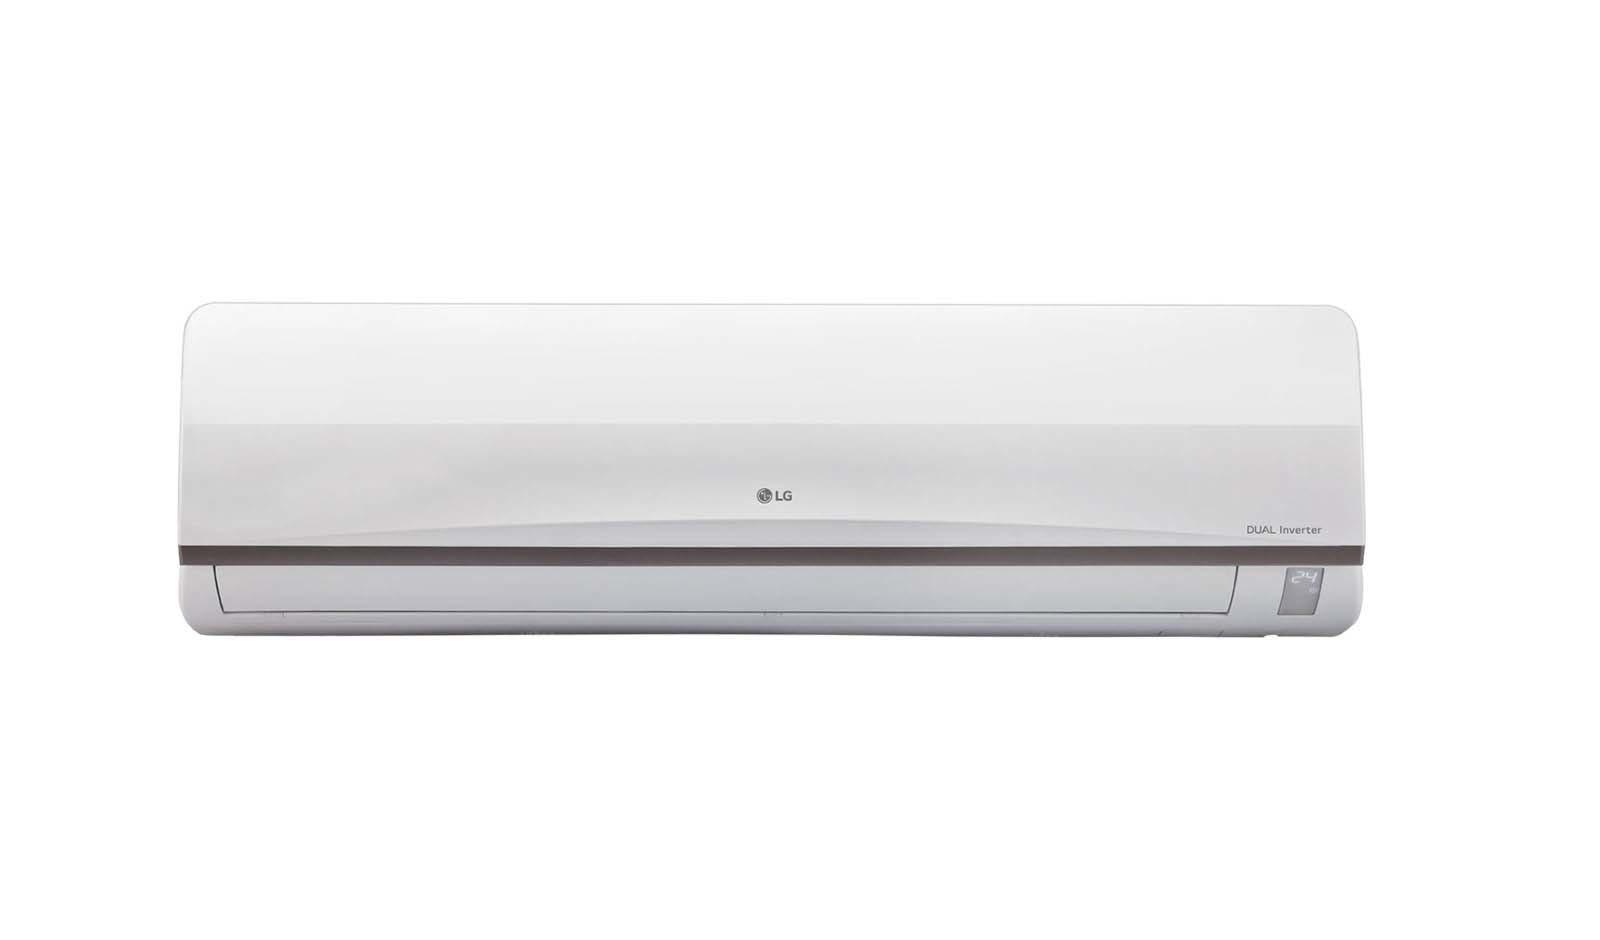 LG 1.5 Ton 3 Star (2017) Inverter Split AC (JS-Q18SPXD White)